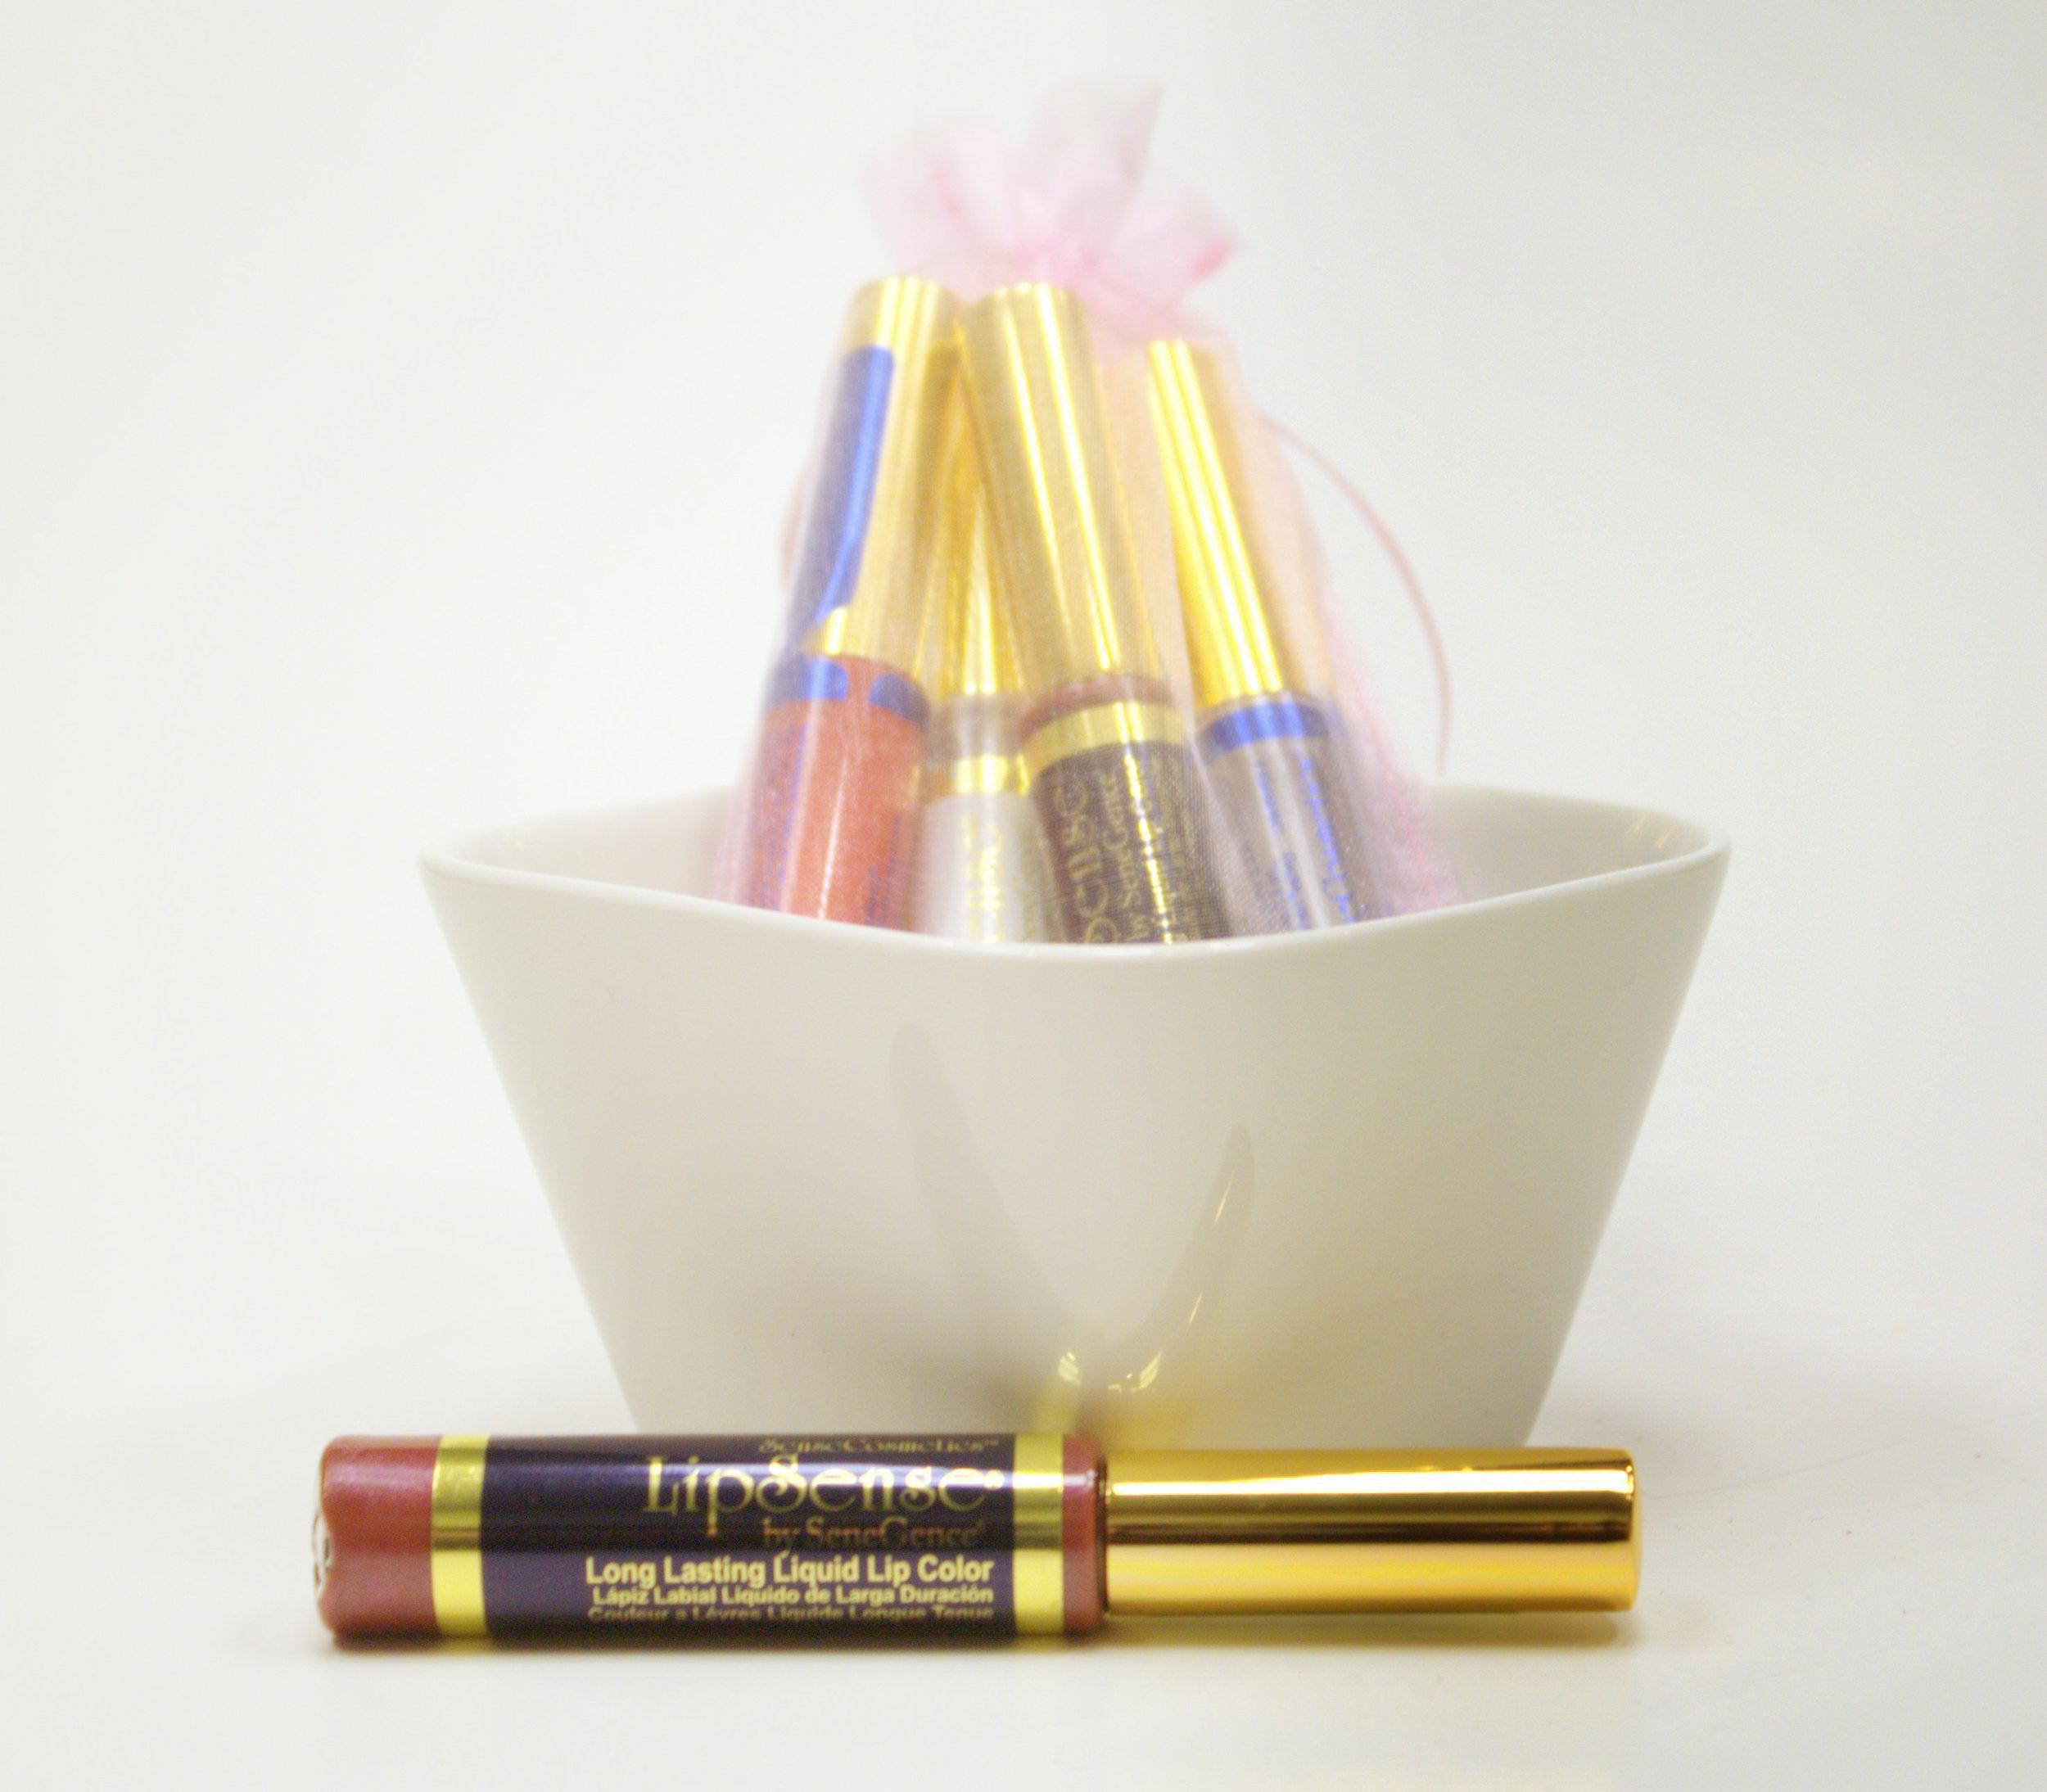 The Makeup Bar – LipSense Lexie Bear-y 18 Hour Liquid Lip Color $25